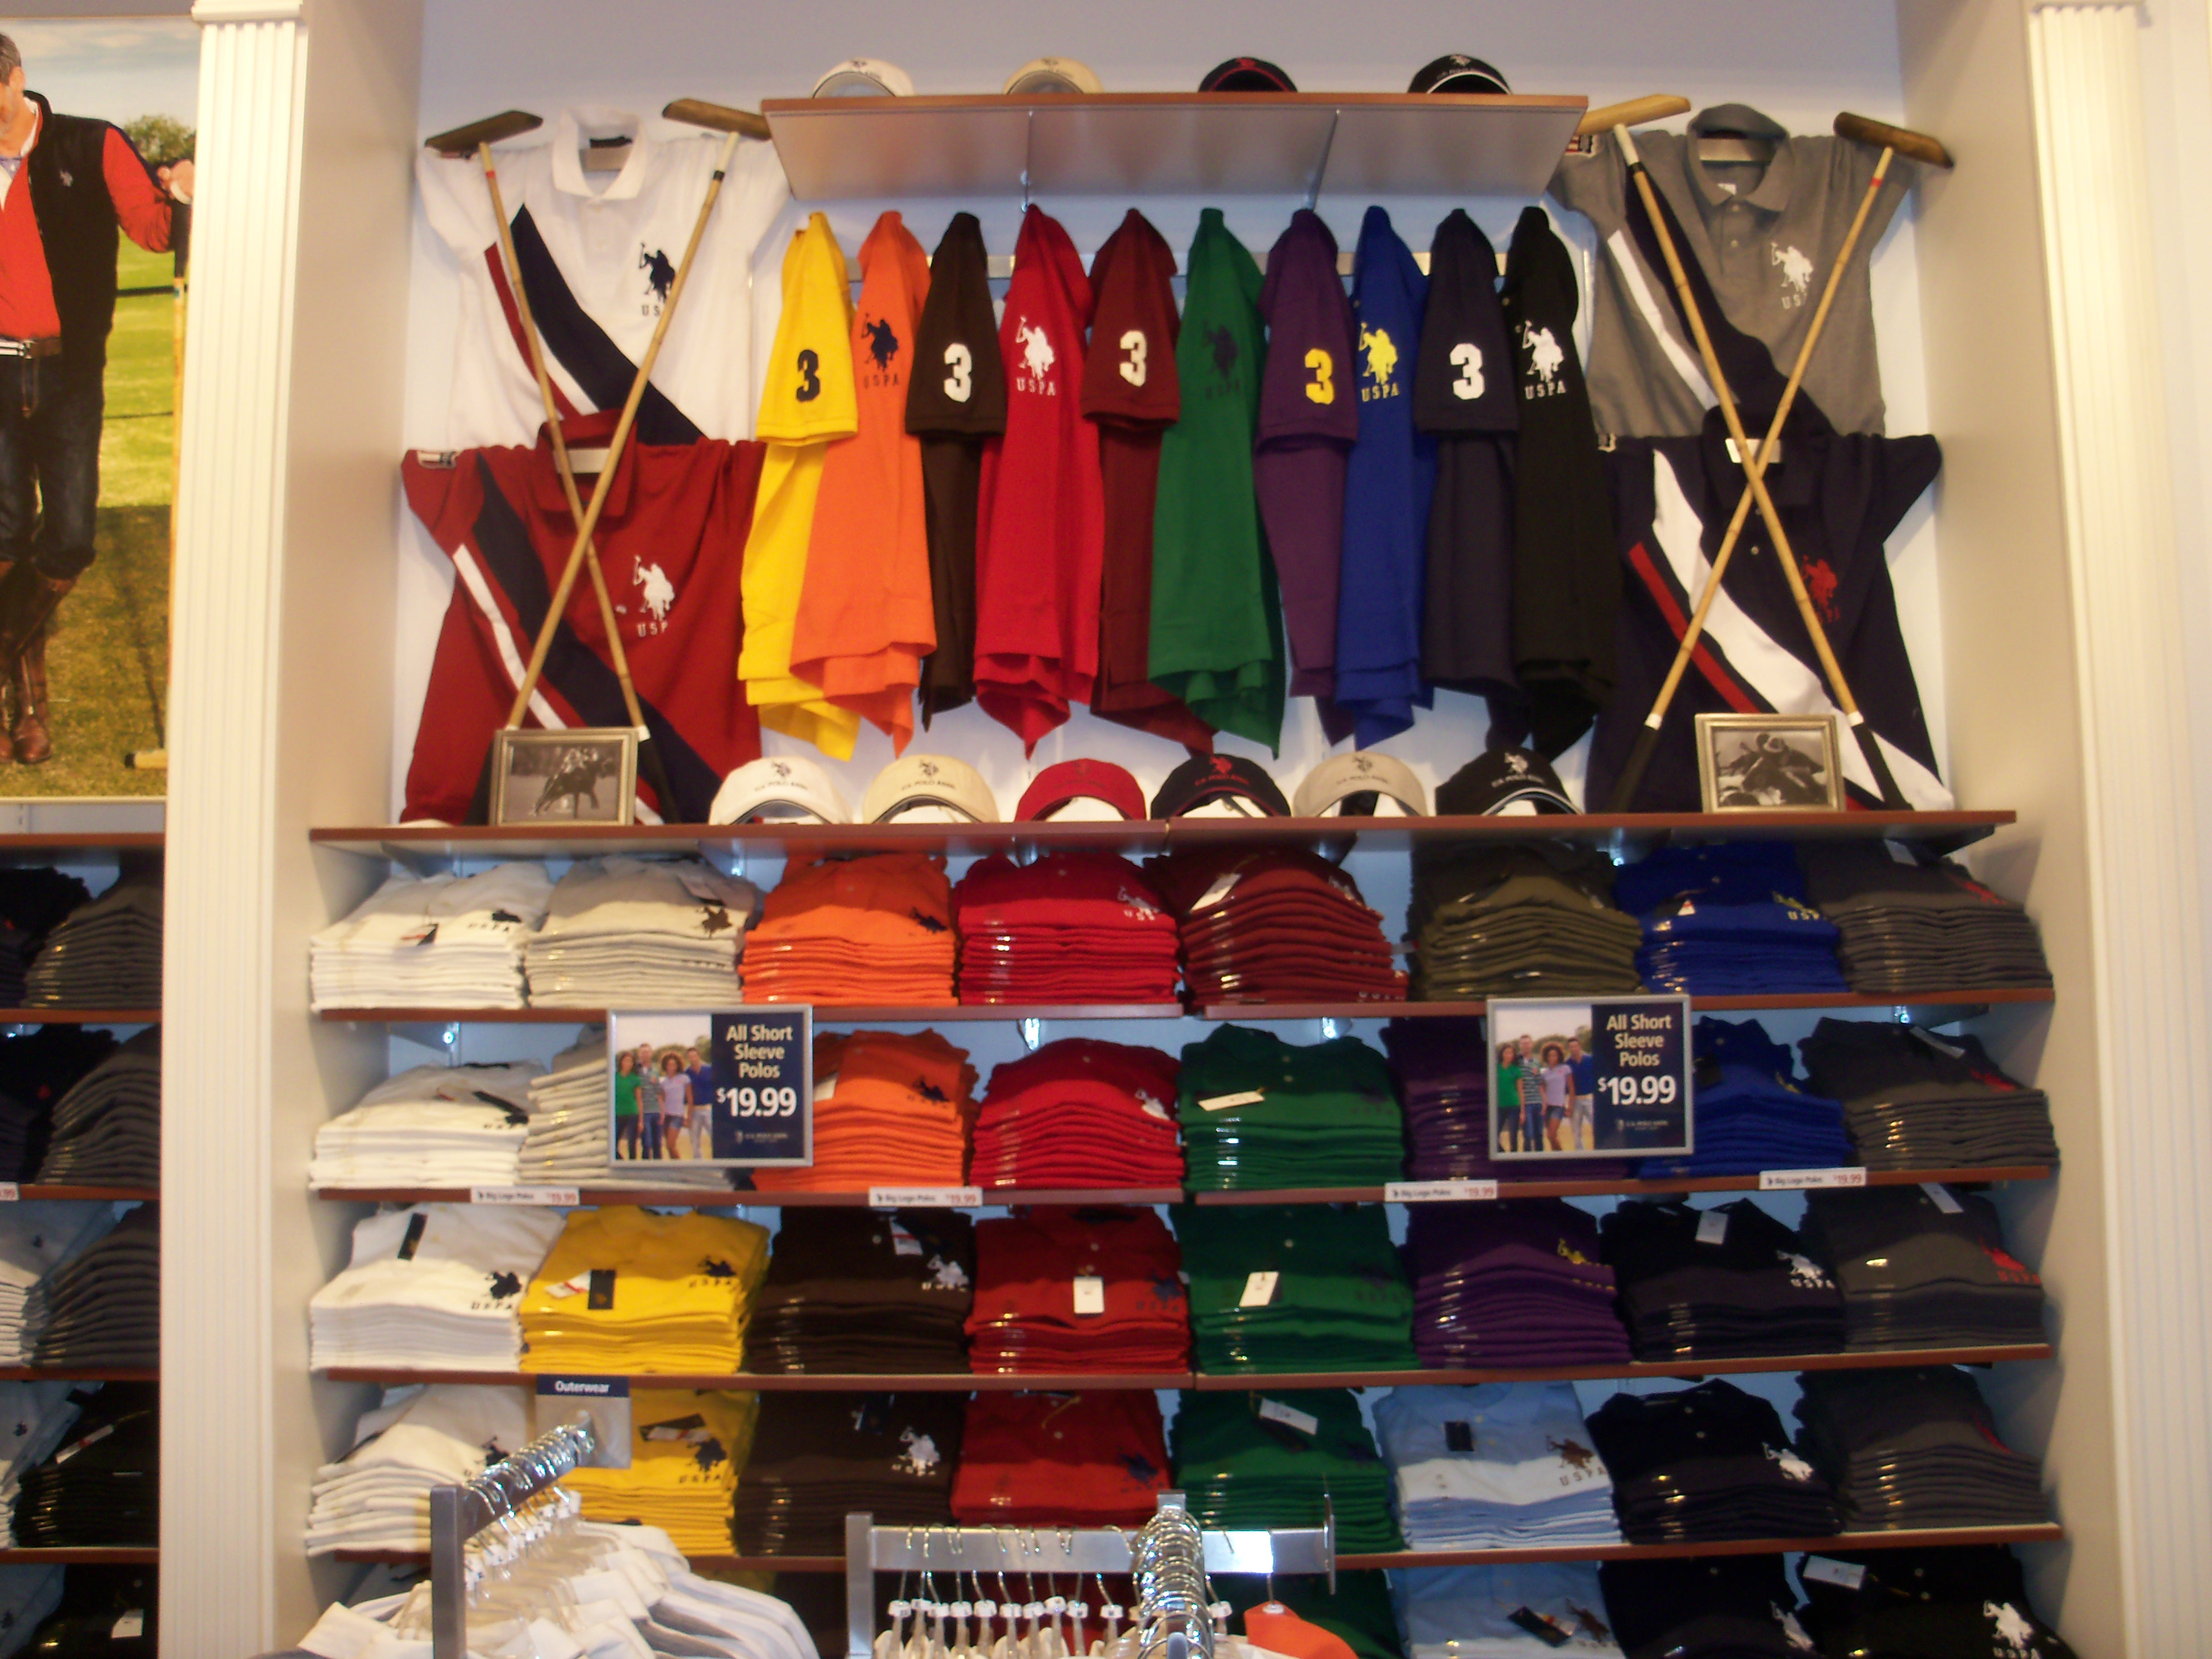 U.S. Polo Assn. Outlet image 3